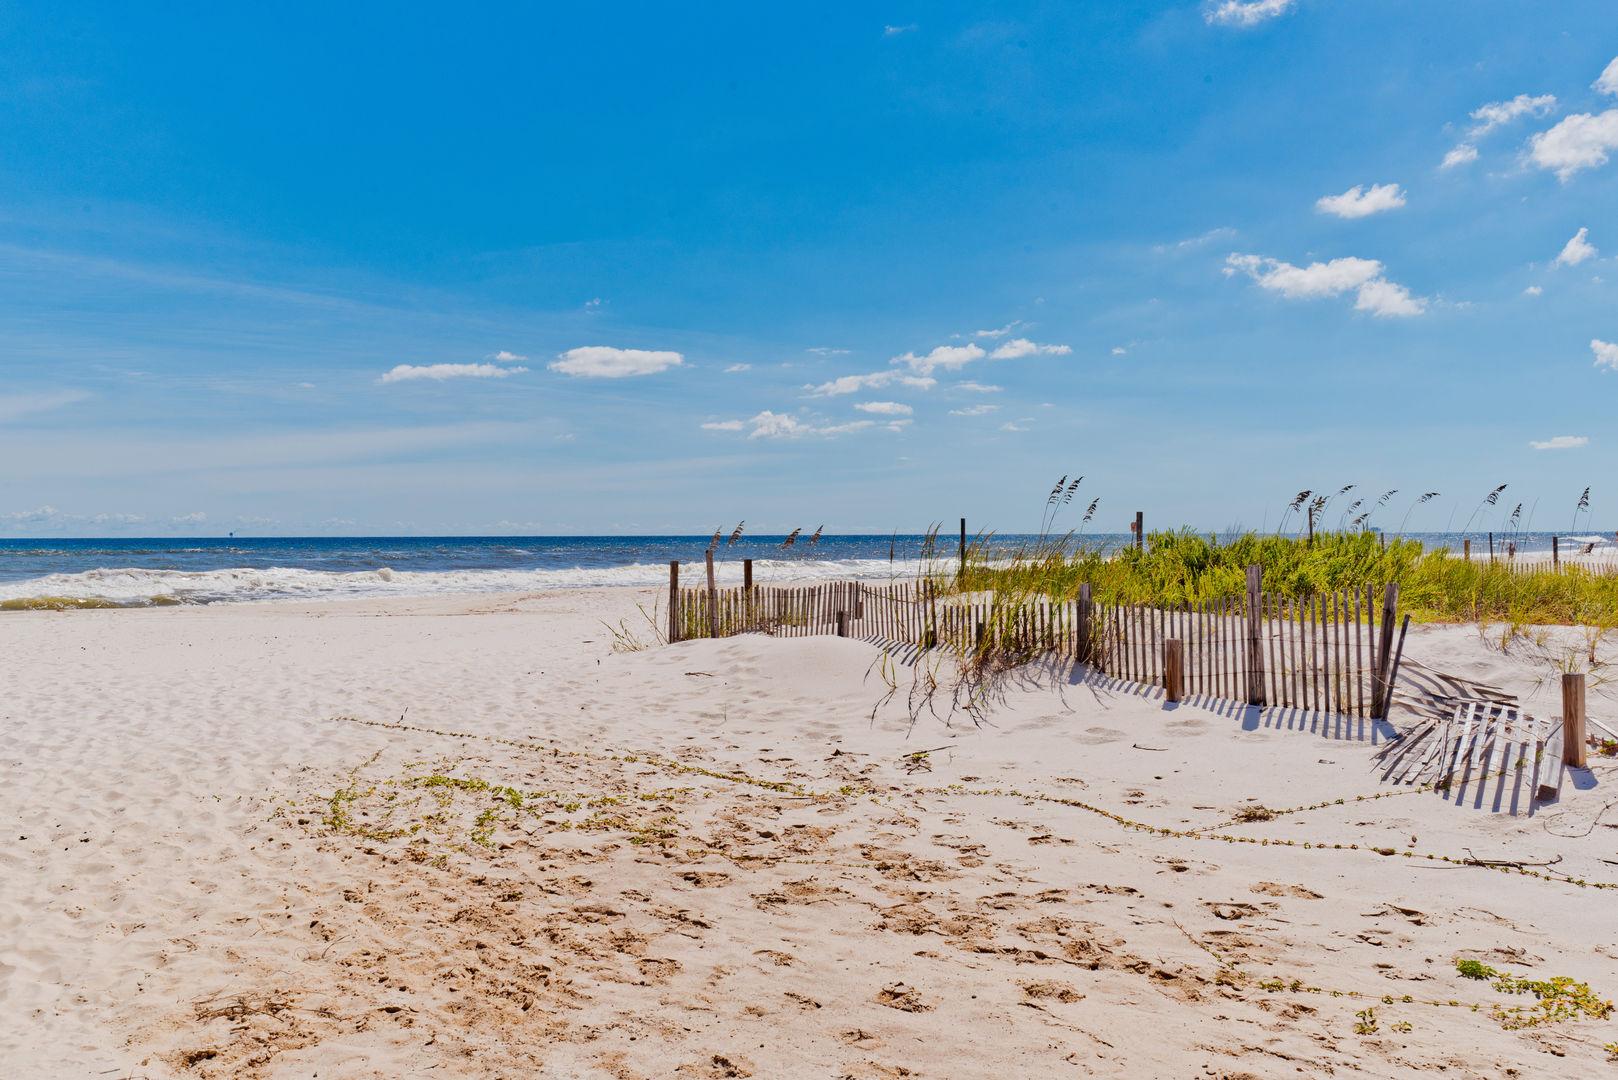 Enjoy the beaches of Fort Morgan!